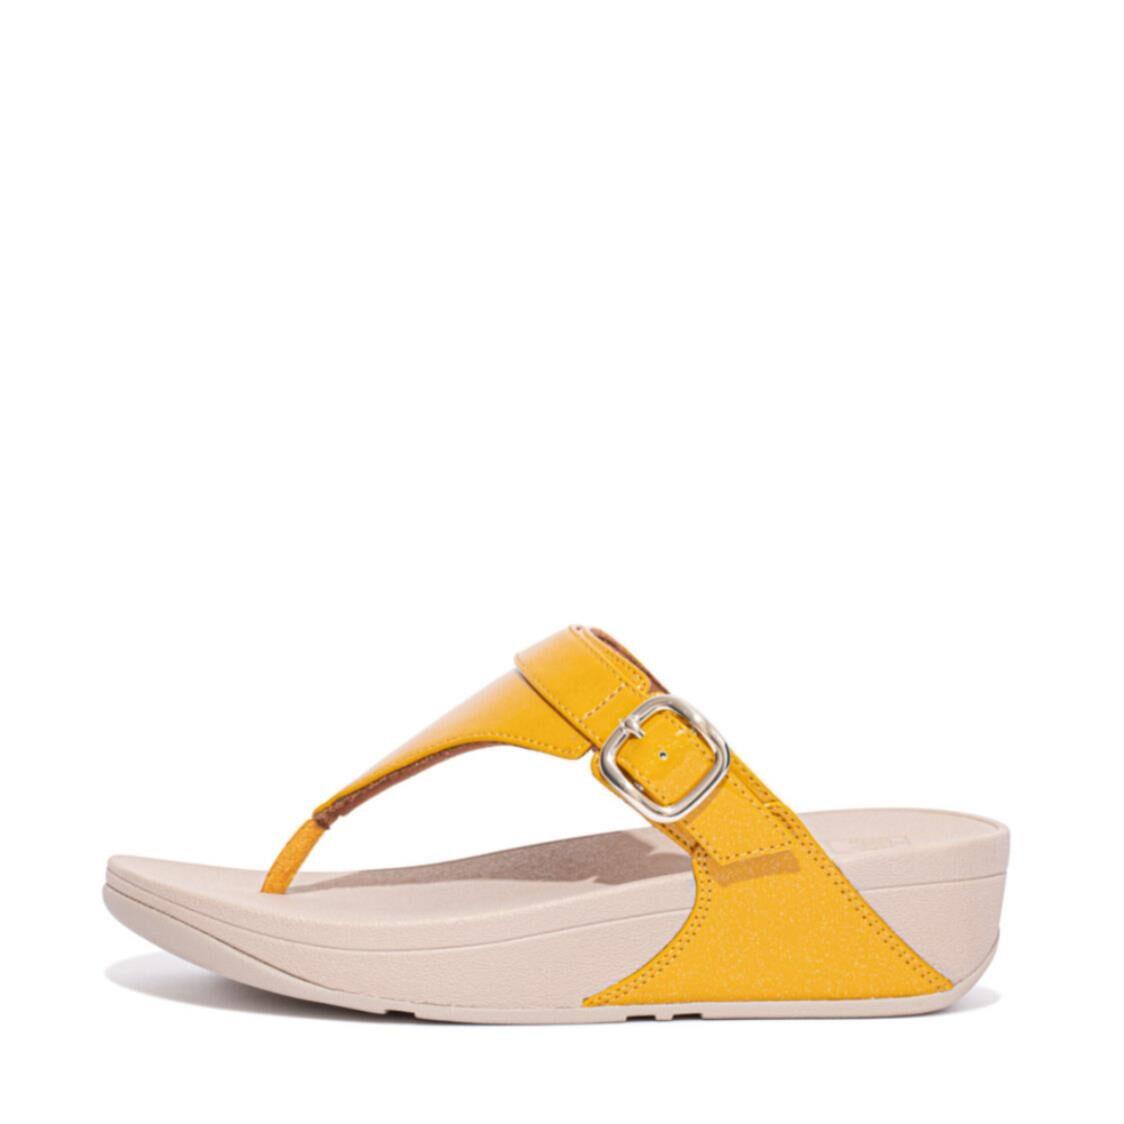 Fitflop Lulu Glitter Adjustable Toe-post Sandals Honey Yellow EC9-891